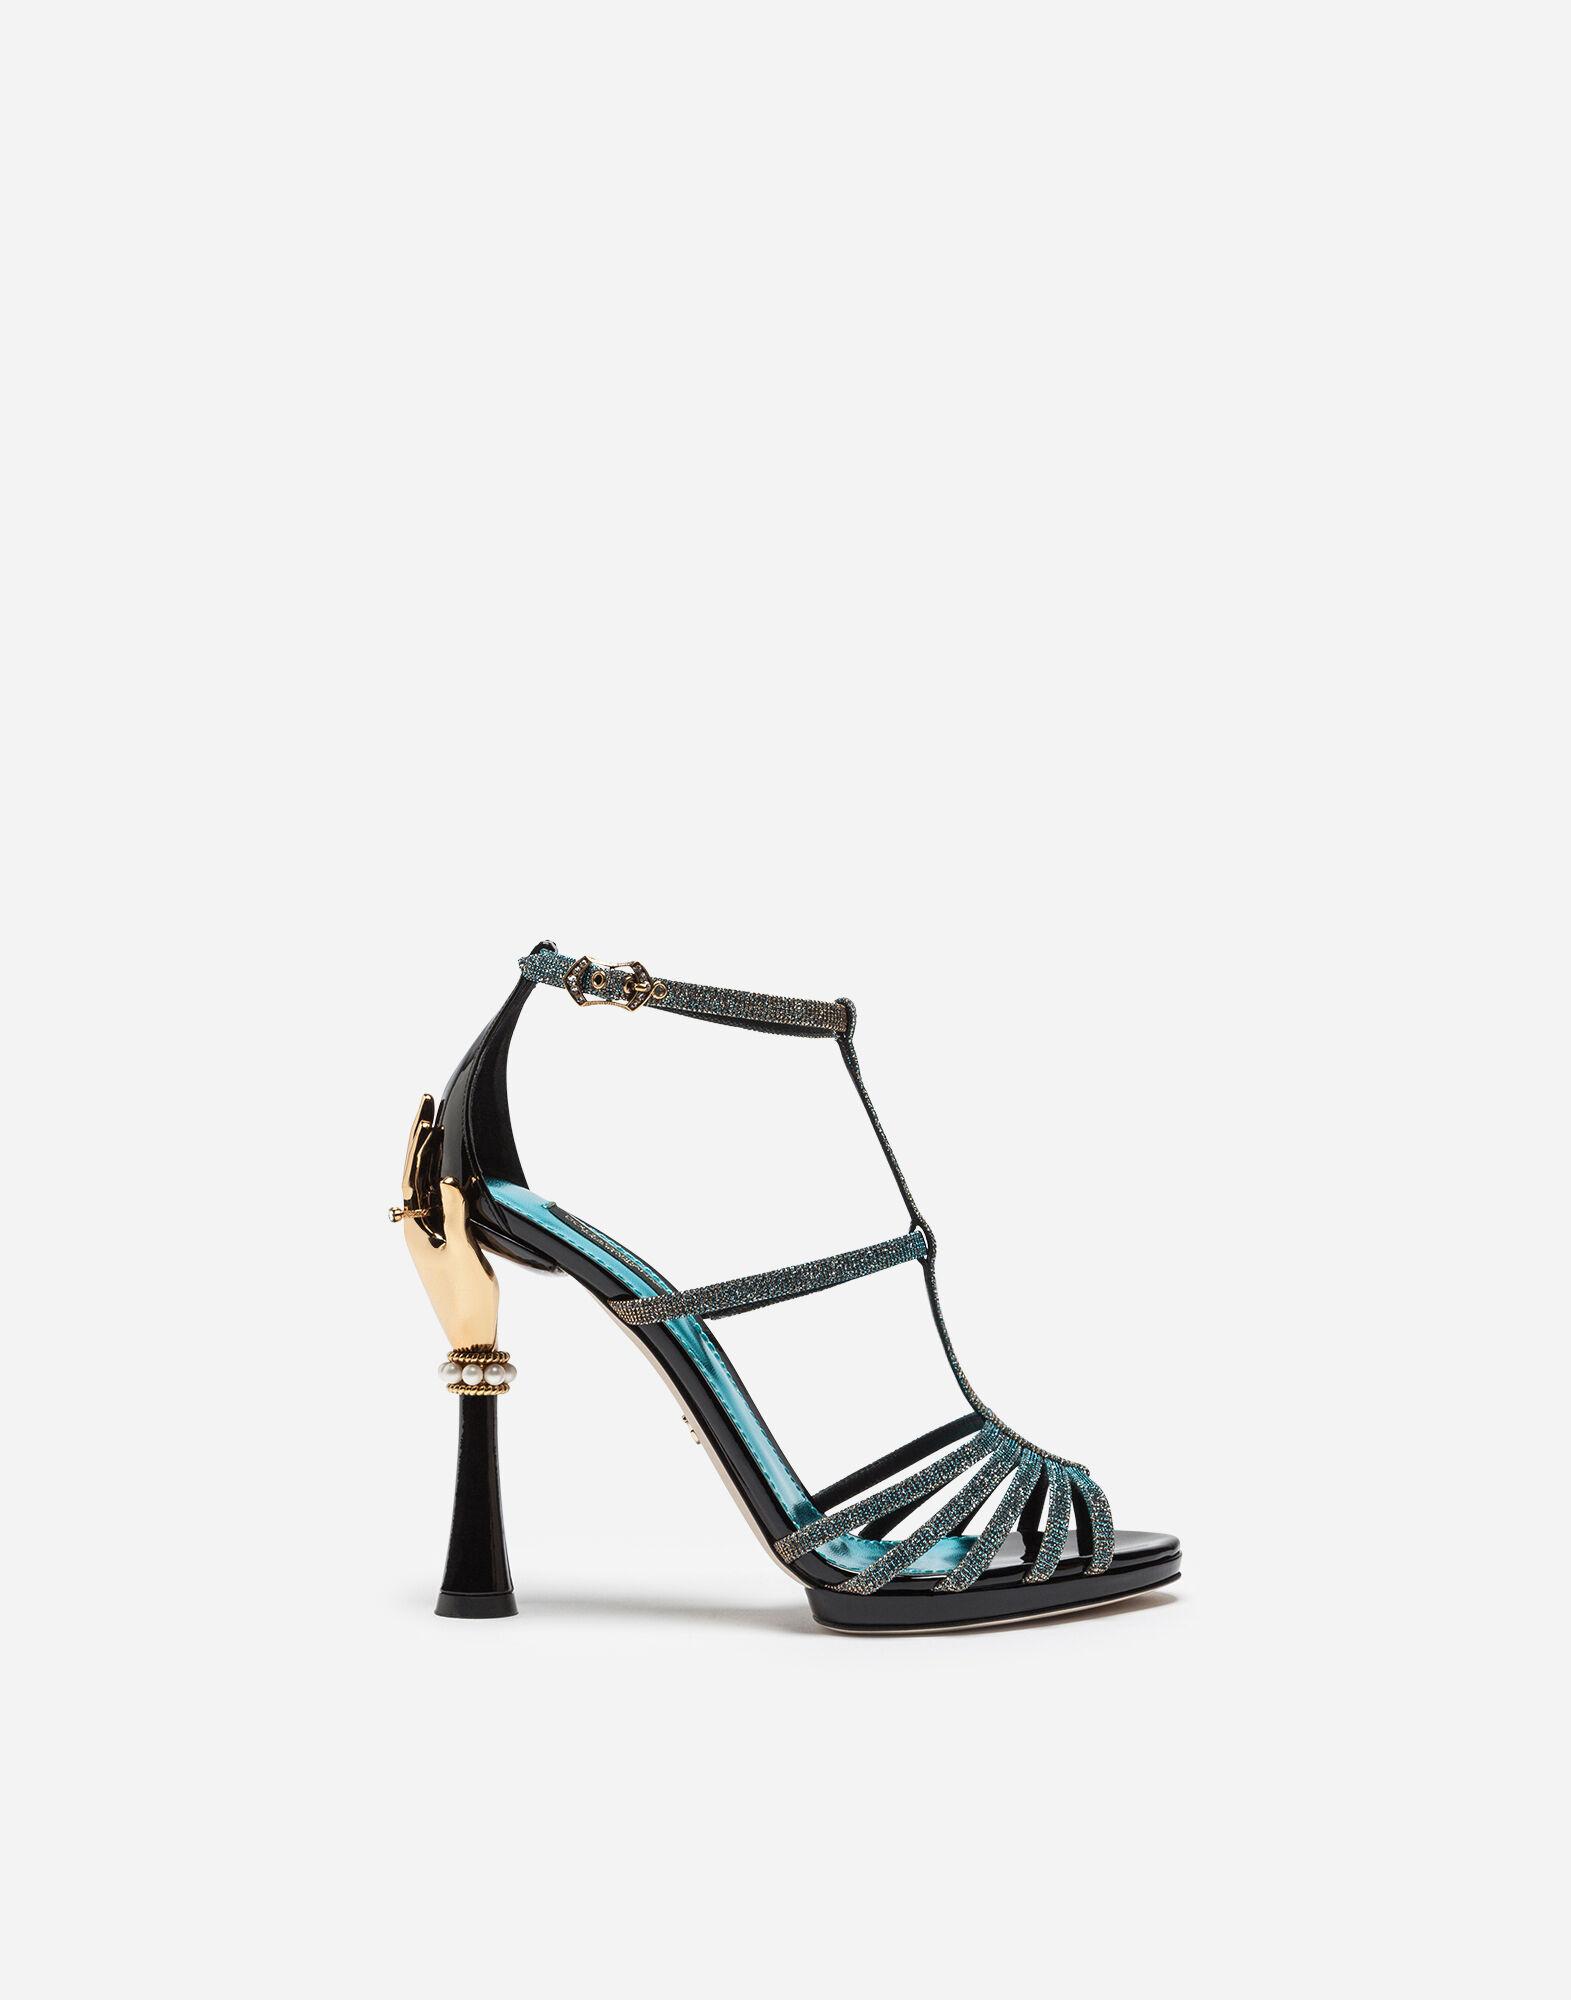 Dolce & Gabbana Woman Bianca Raffia-trimmed Embellished Printed Patent-leather Sandals Blue Size 35.5 Dolce & Gabbana Bfh5d